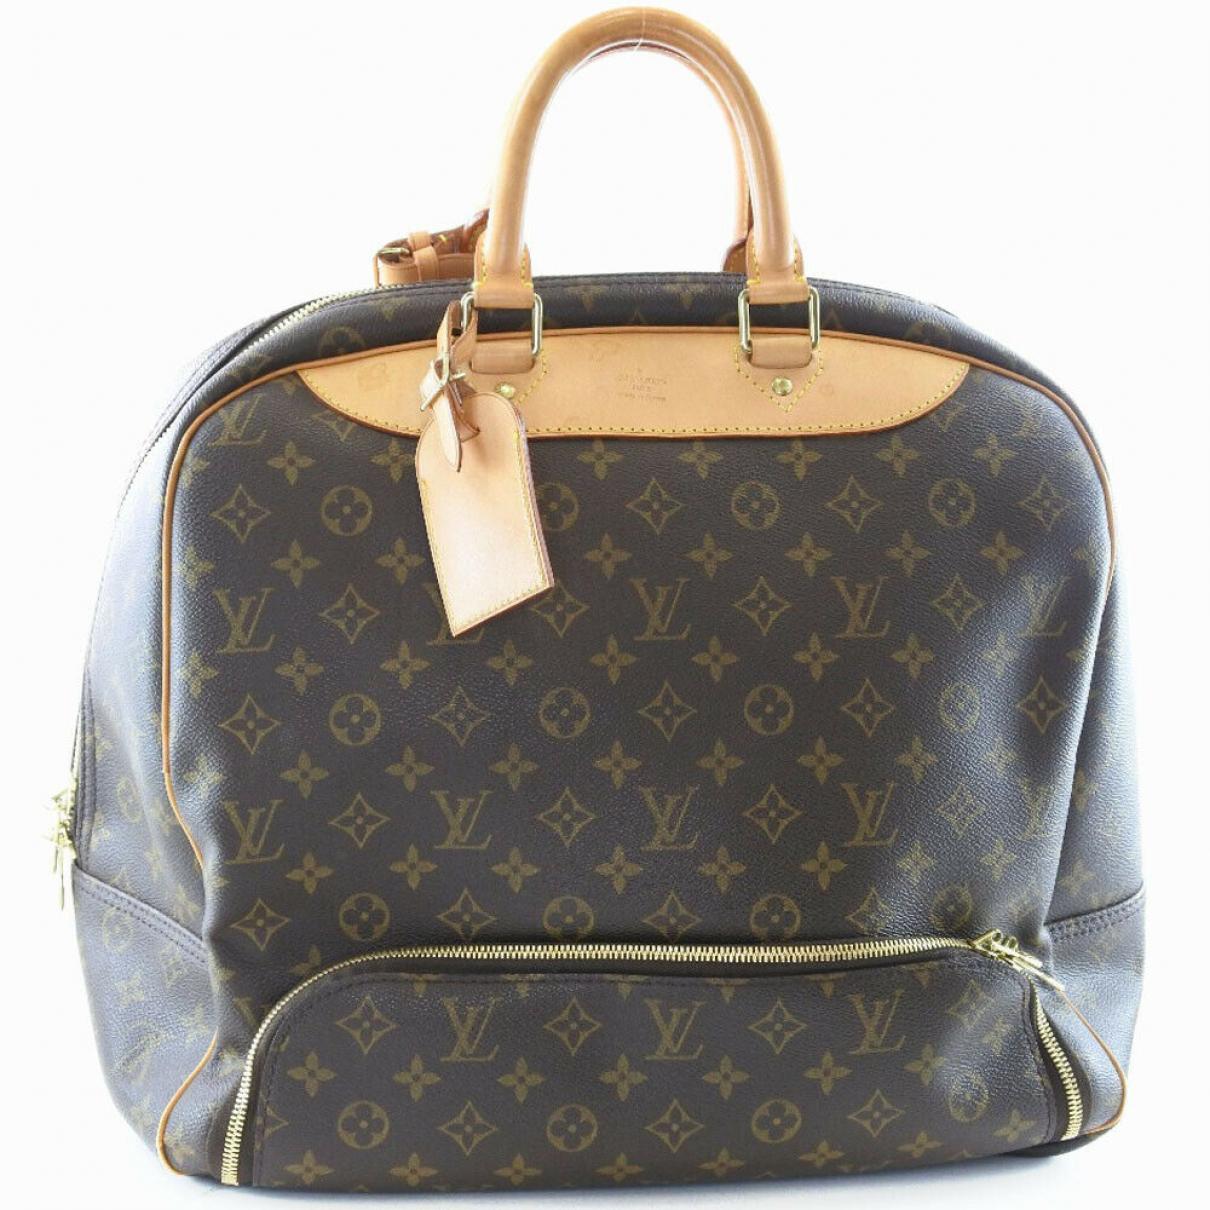 Louis Vuitton \N Leather Travel bag for Women \N